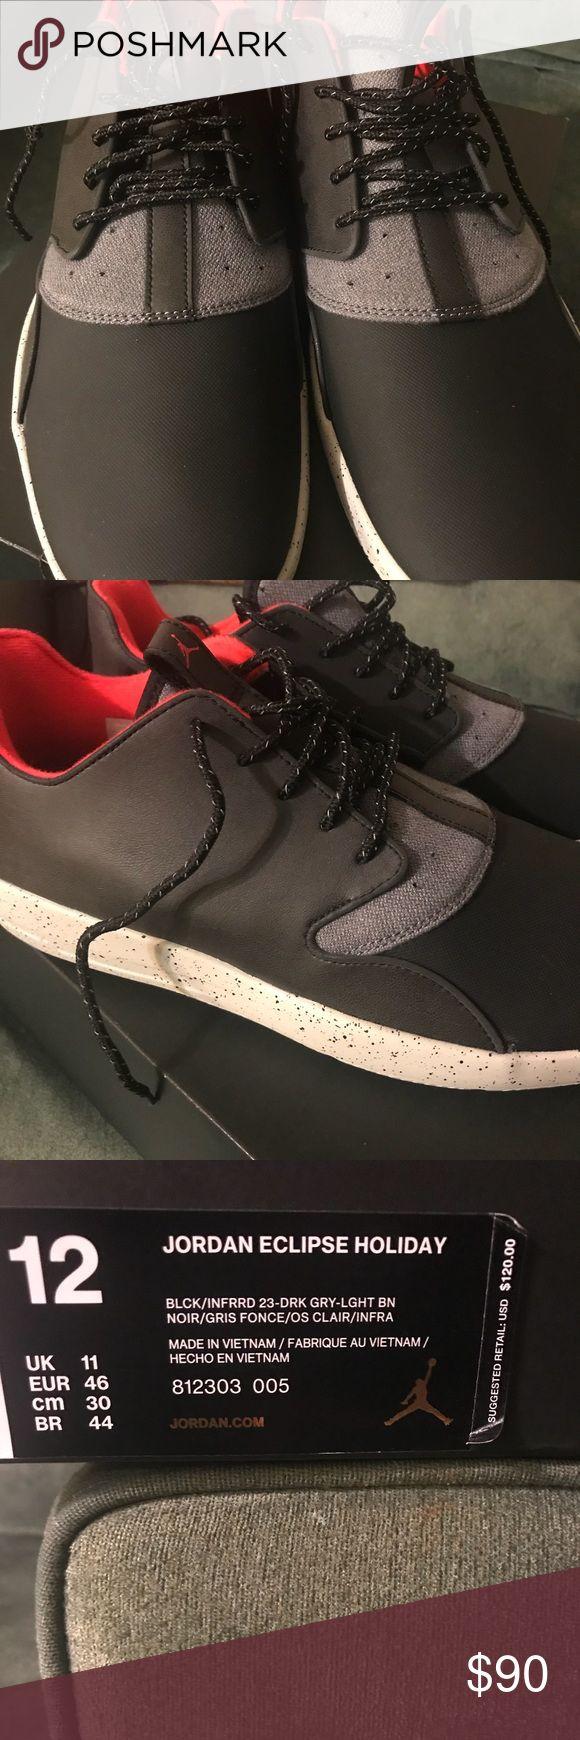 Jordan Eclipse Holiday  Black/Infrrd/Gry Brand New Men's Jordan's Eclipse Shoe Jordan Shoes Sneakers